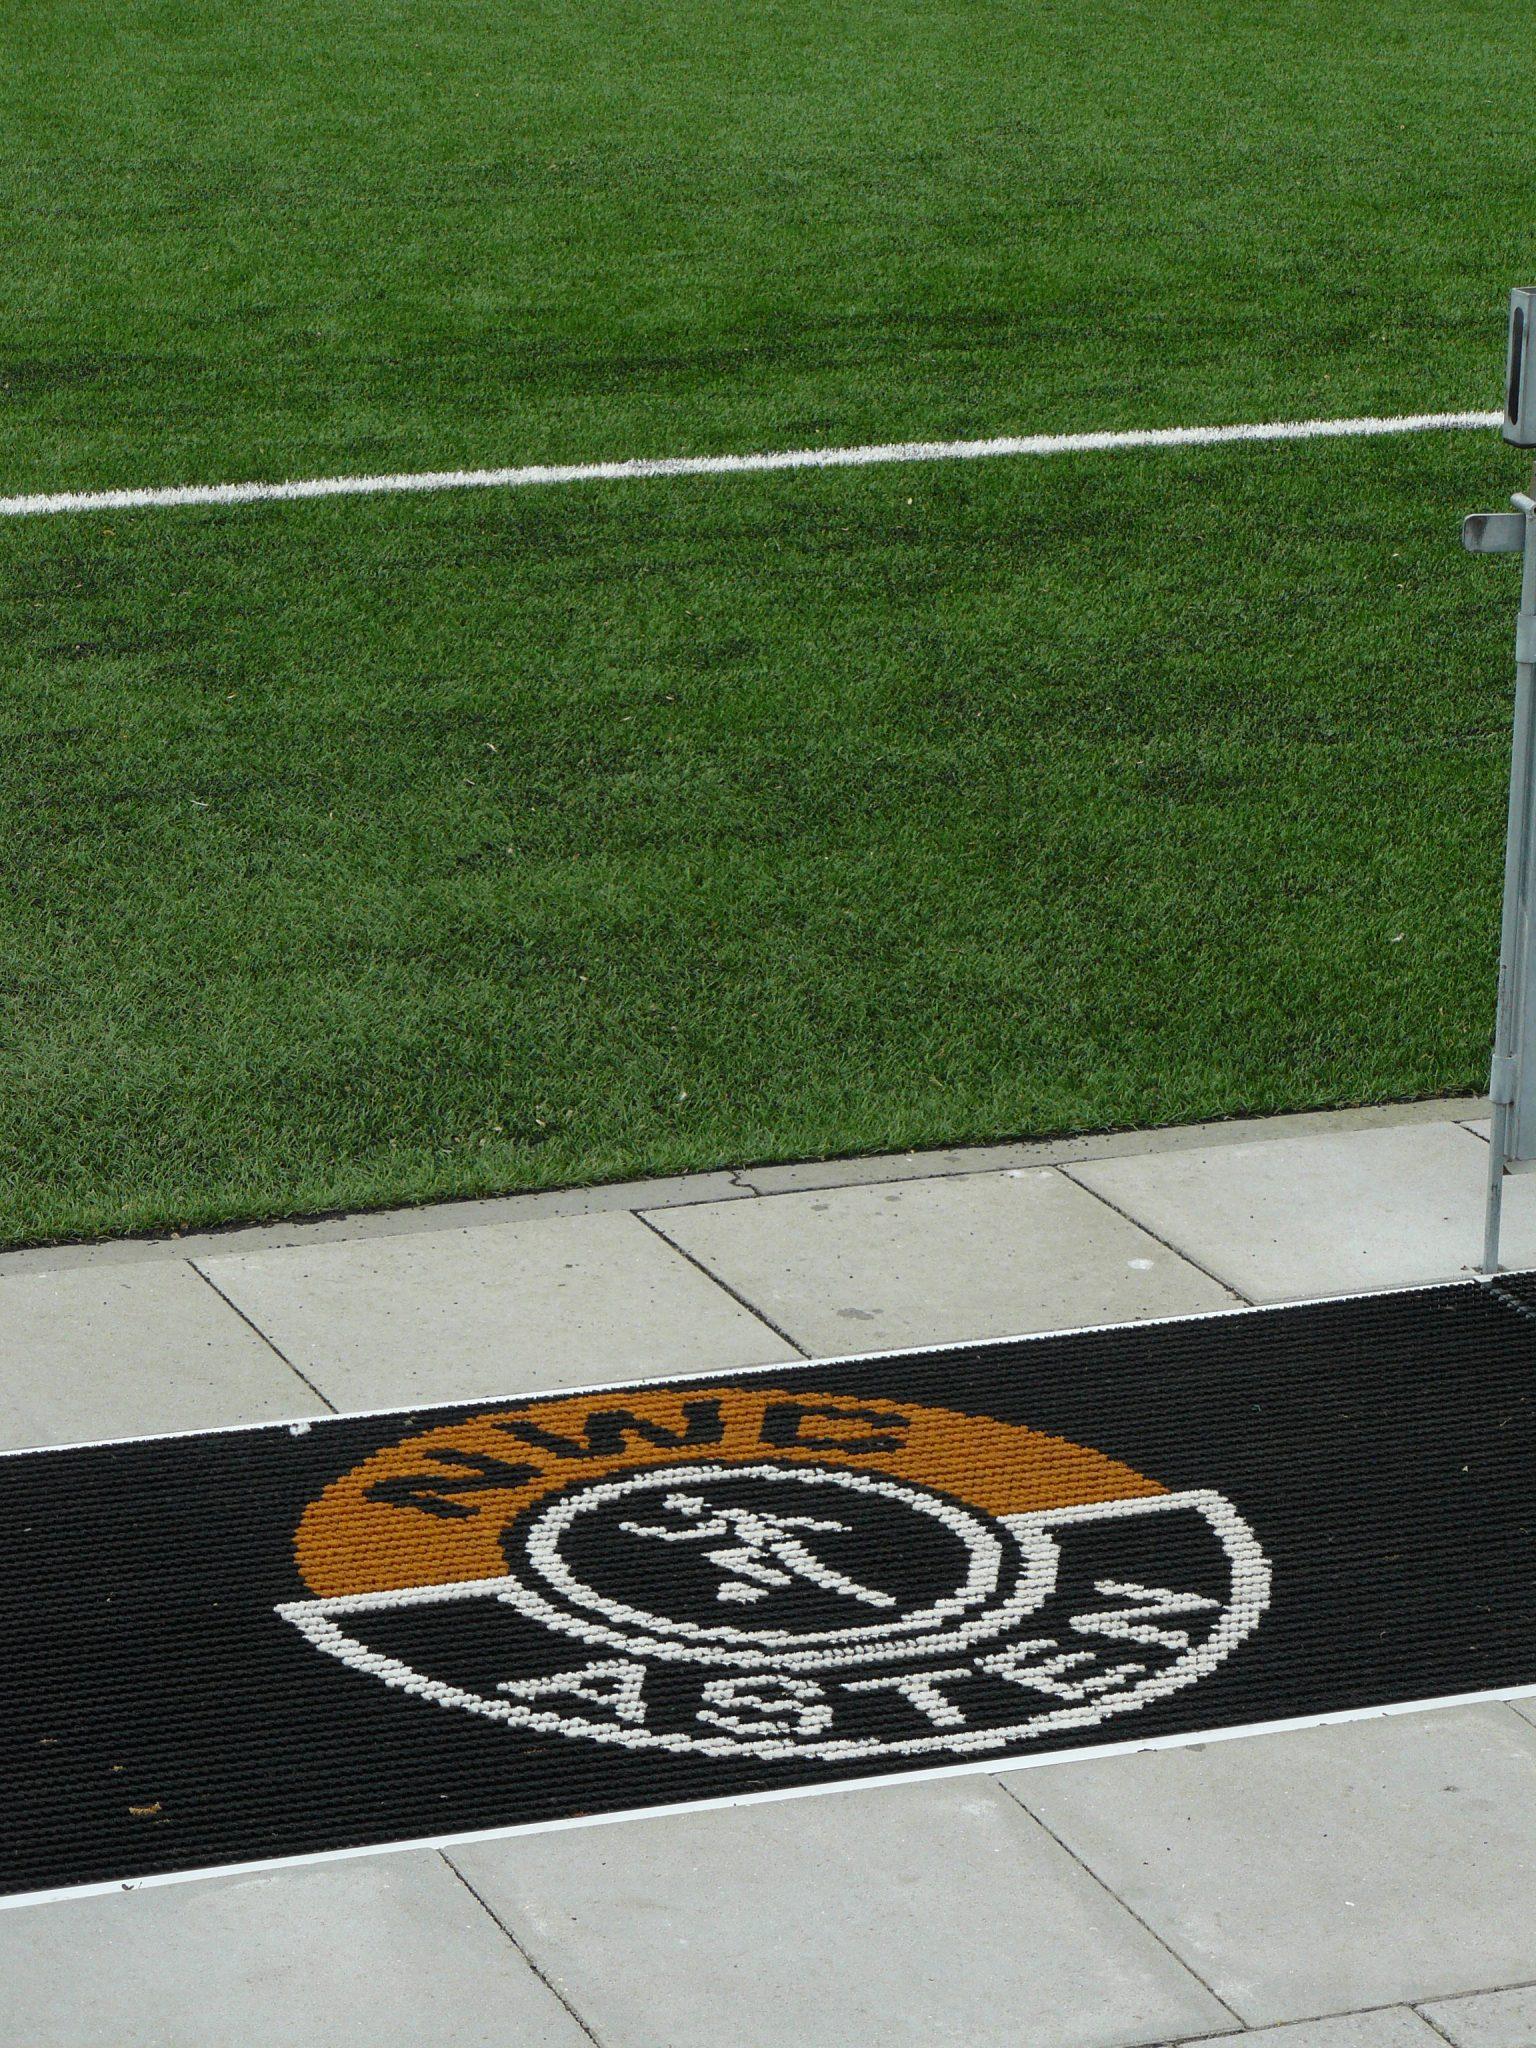 - Update-  Walking Football van start